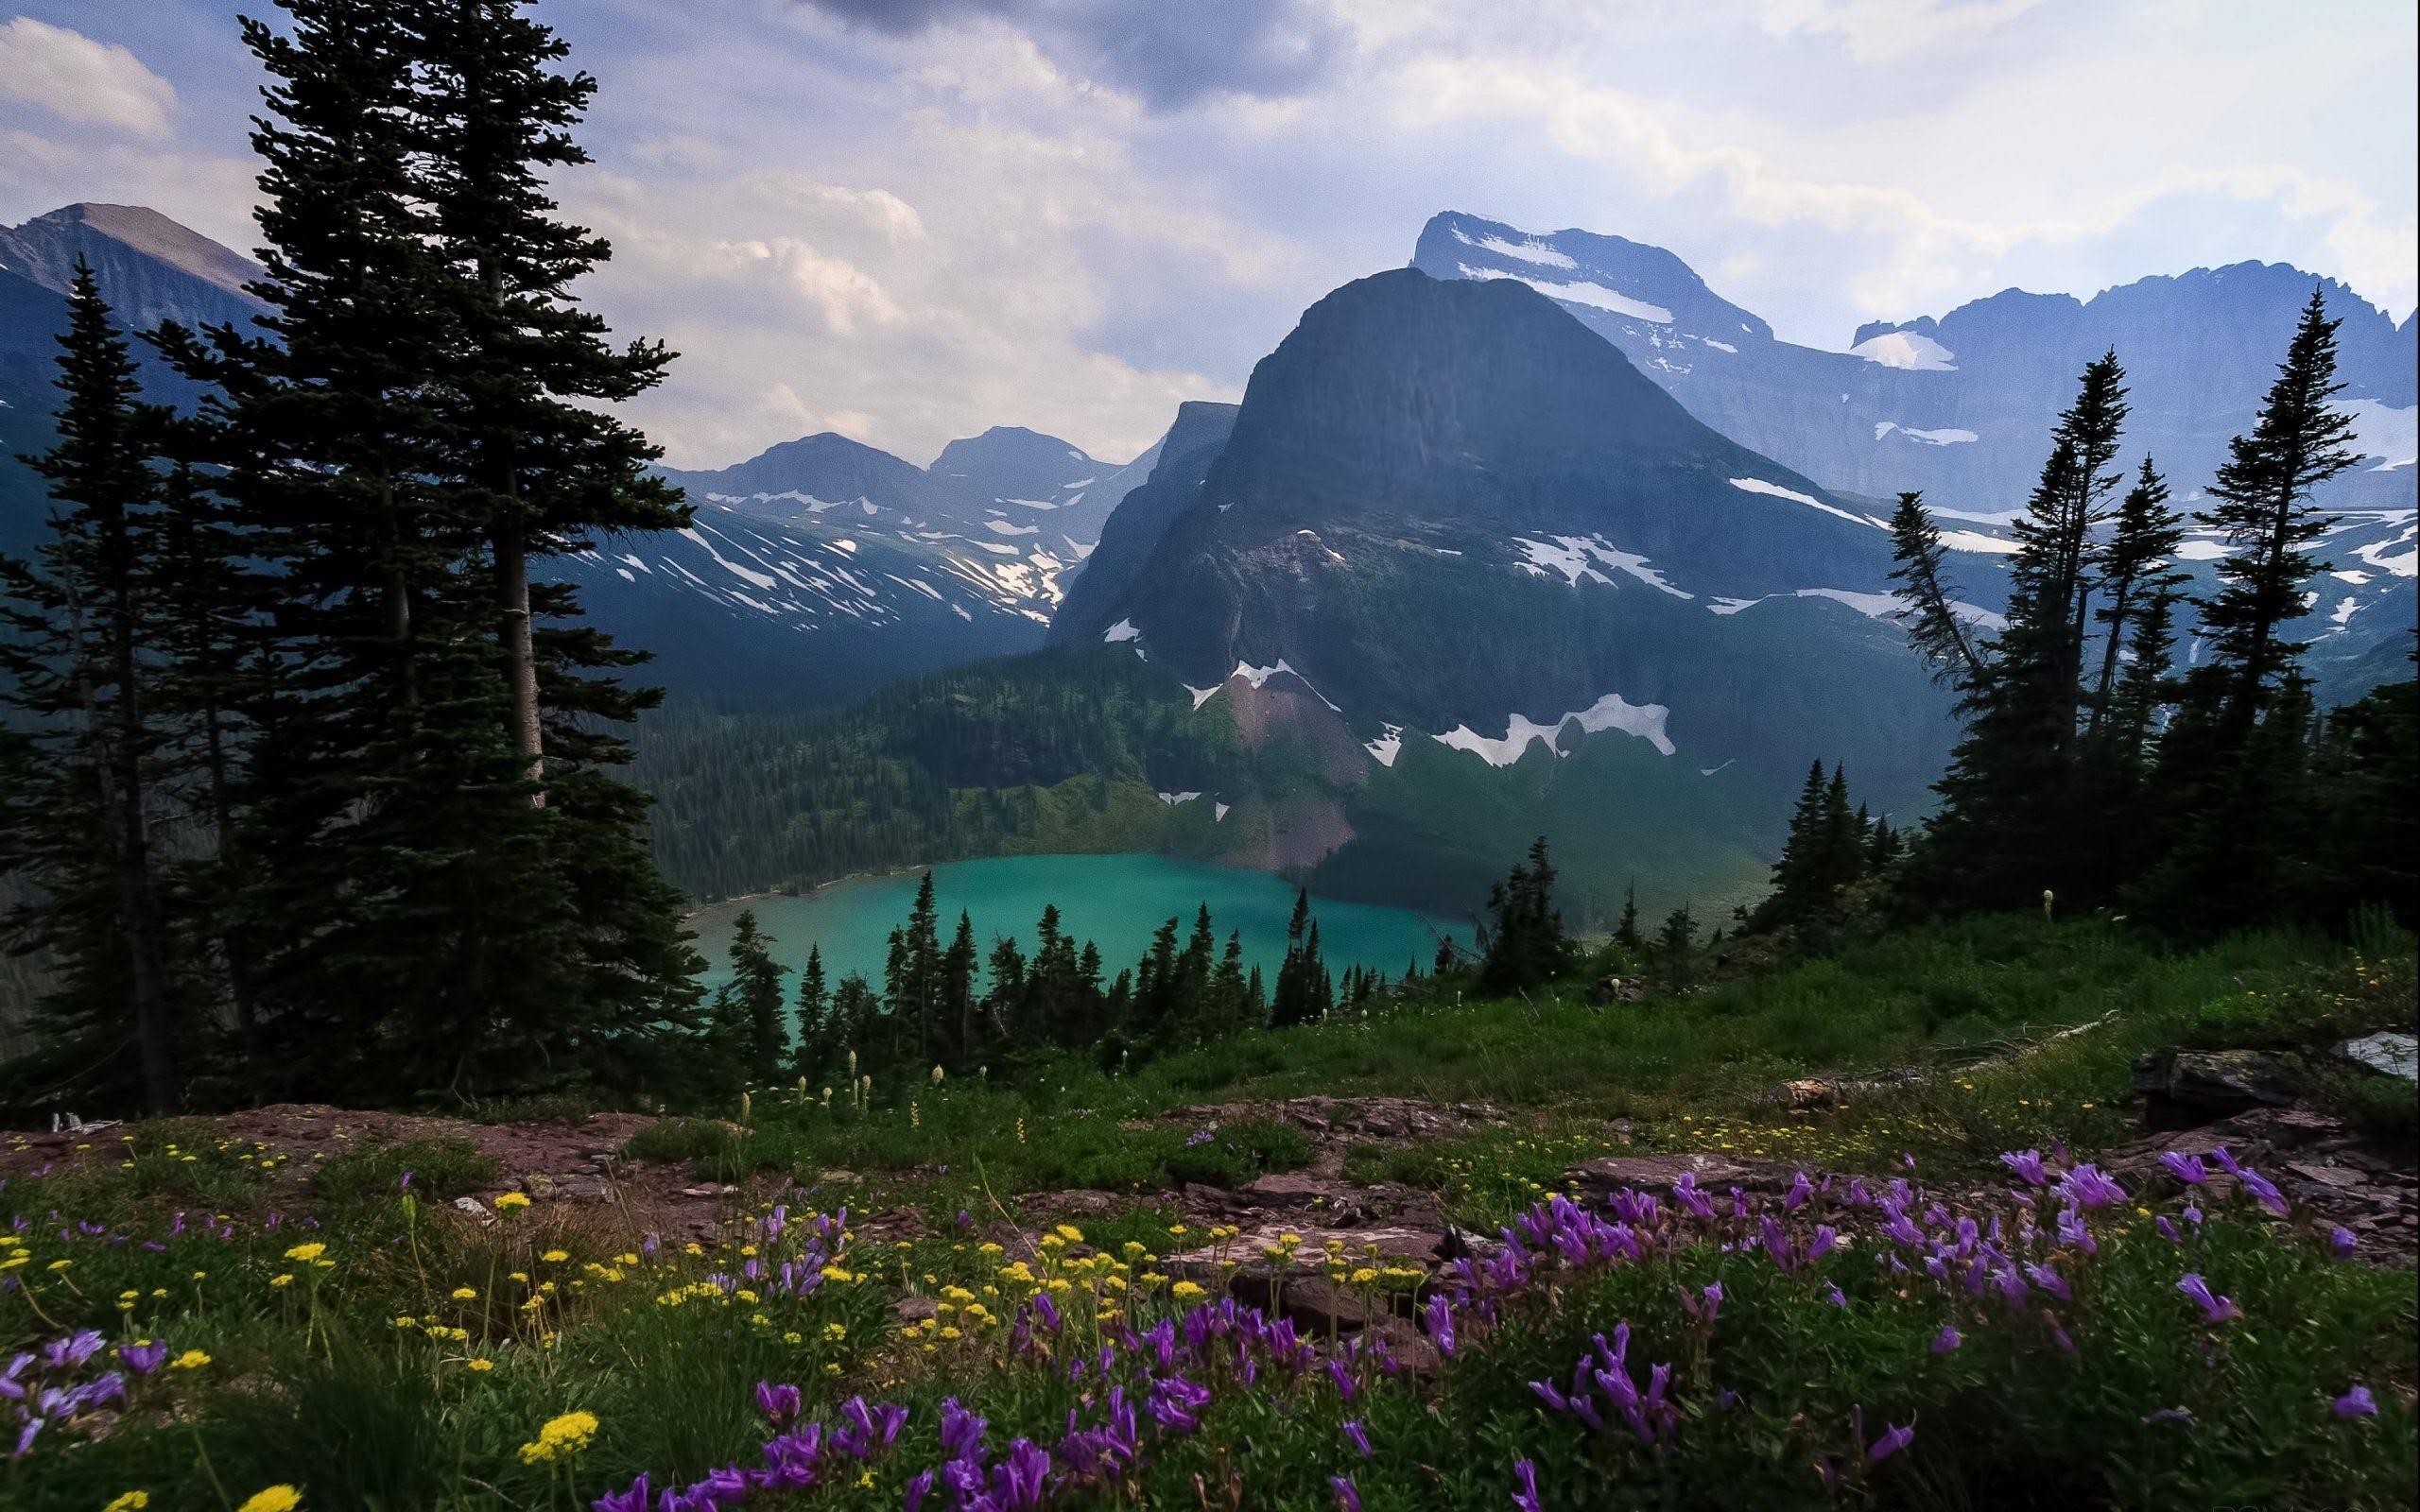 Hd National Parks Wallpaper 46 Images